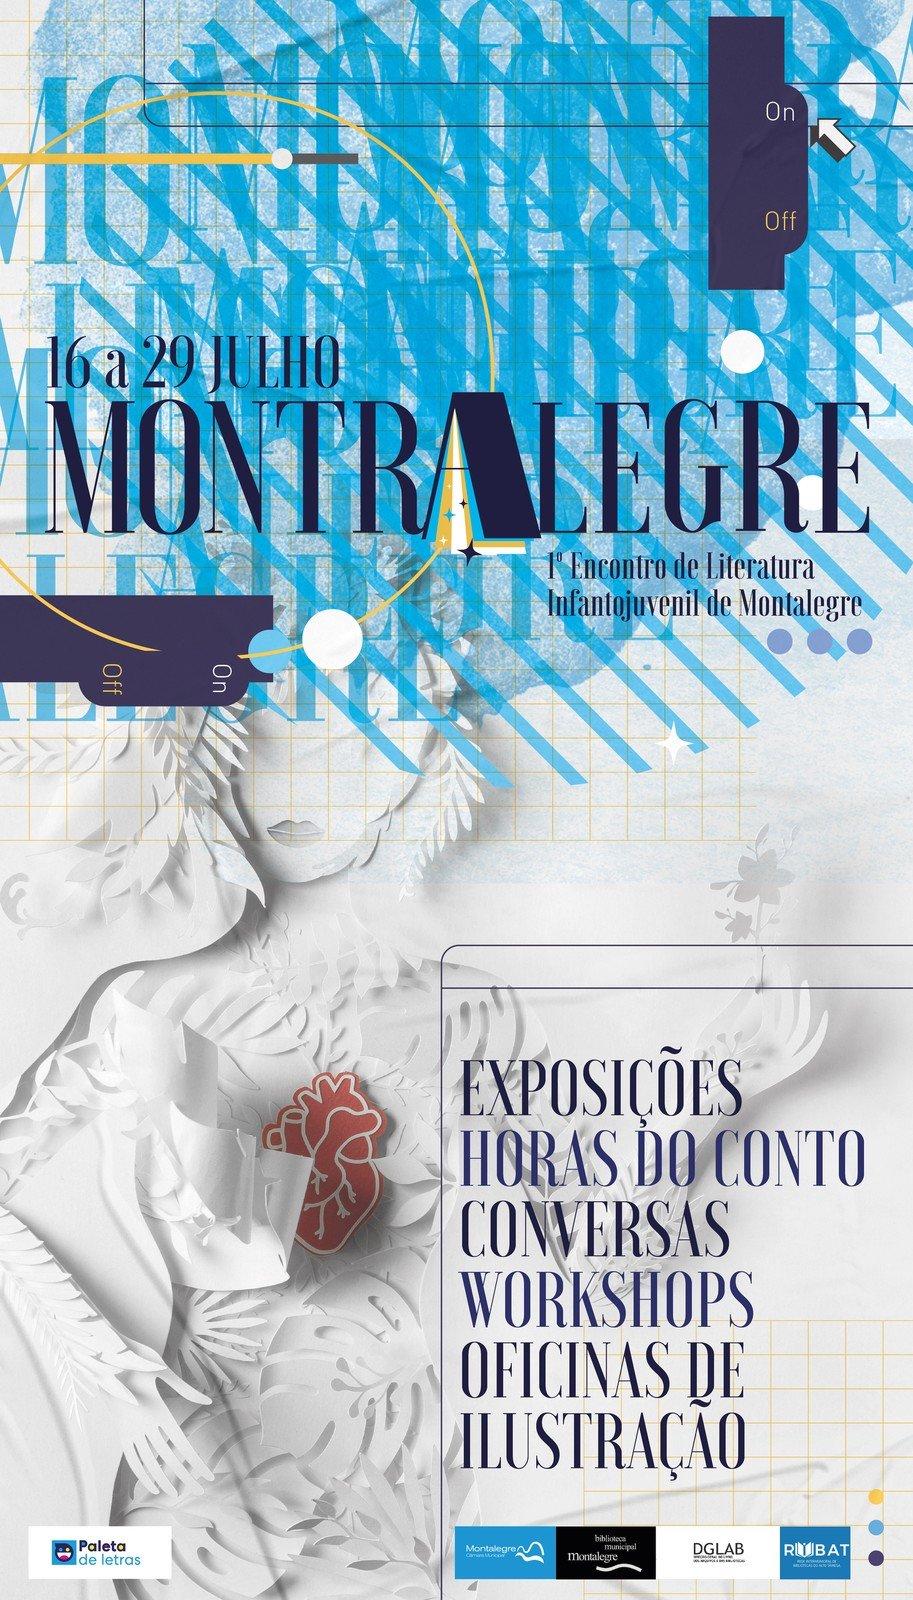 I Encontro de Literatura Infantojuvenil de Montalegre